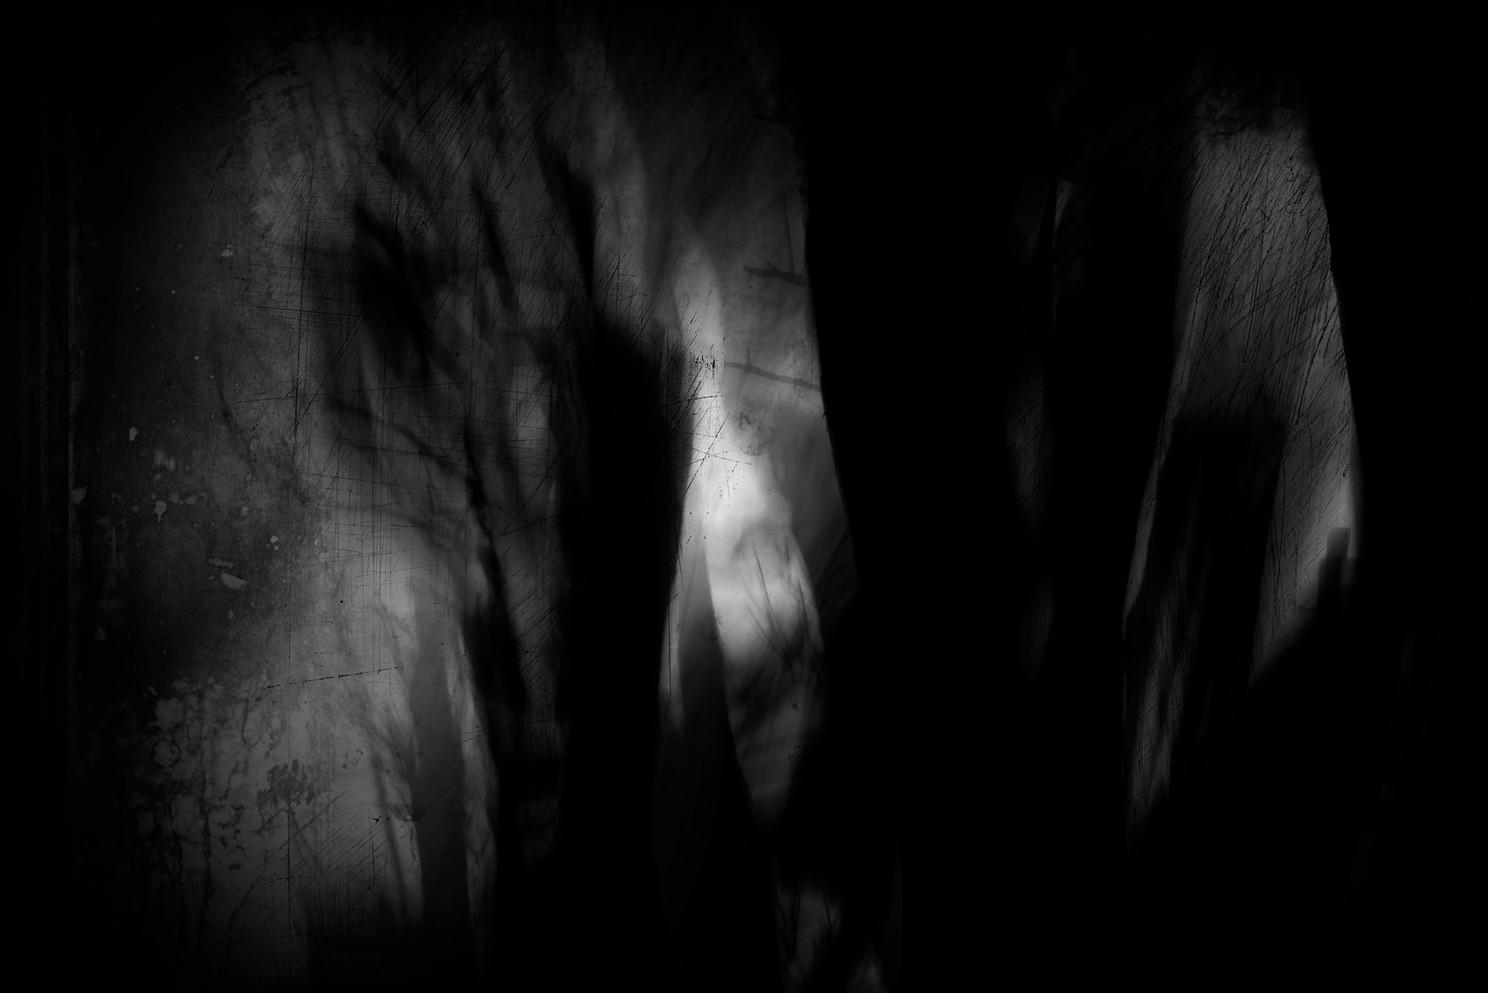 Creep (Copse) 027